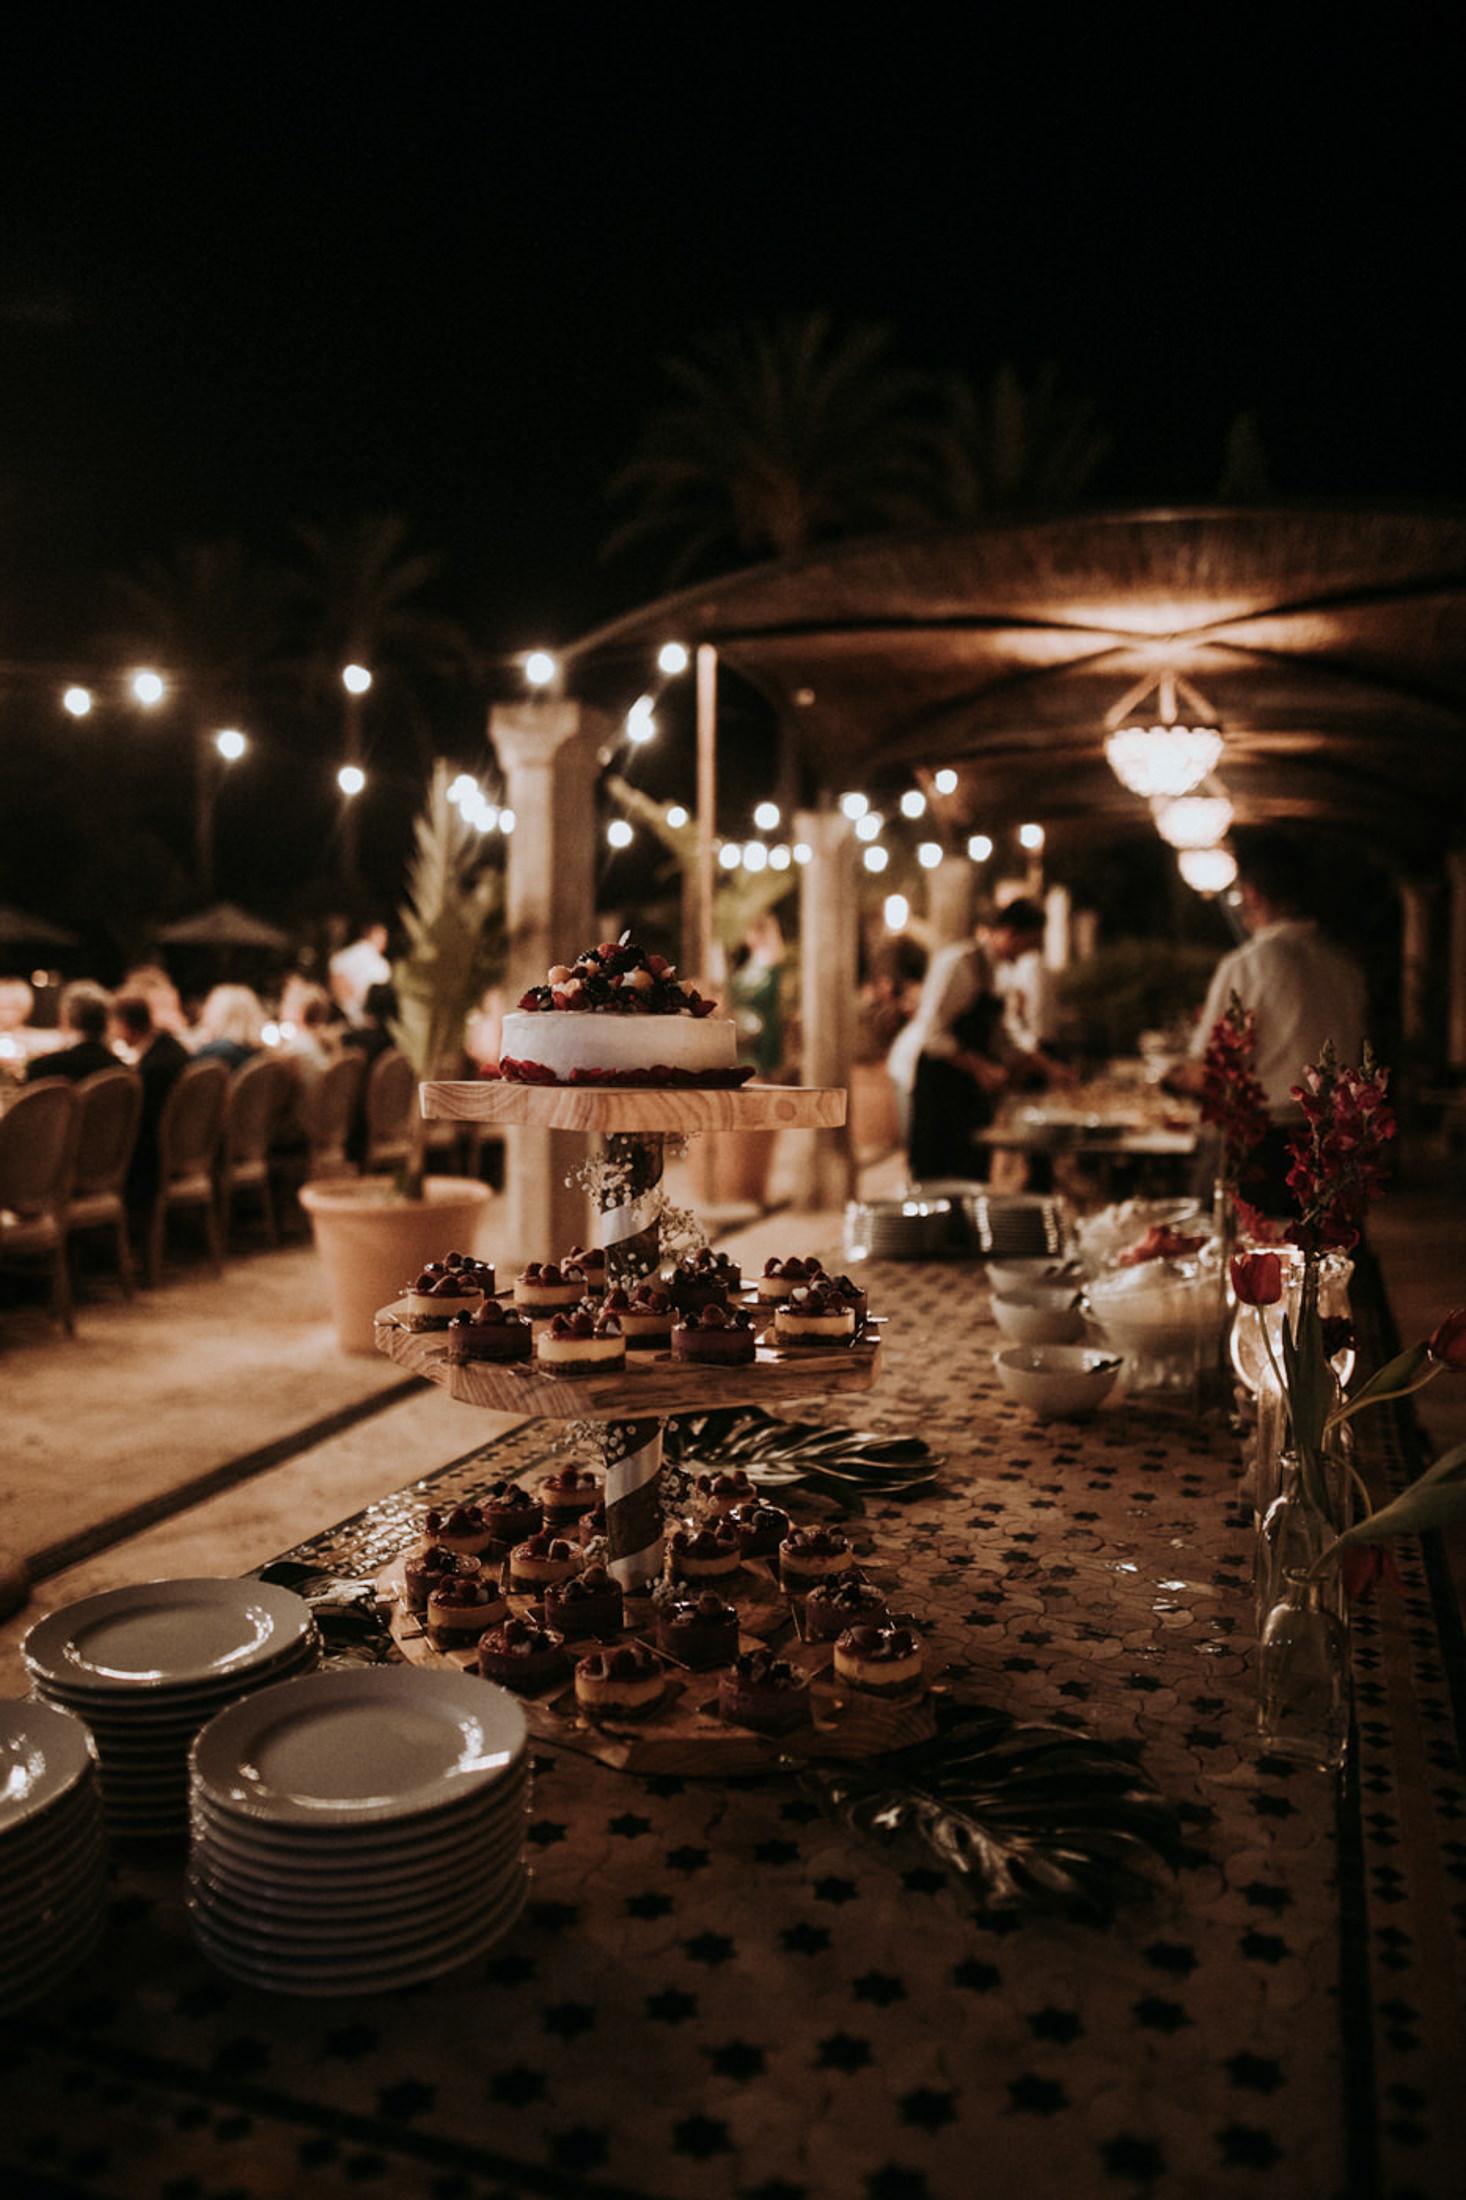 Wedding_Photographer_Mallorca_Daniela-Marquardt_Photography_New_York_Iceland_Tuscany_Santorini_Portugal_Austria_Bavaria_Elopement_Hochzeitsfotograf_AntjeRajat2_116